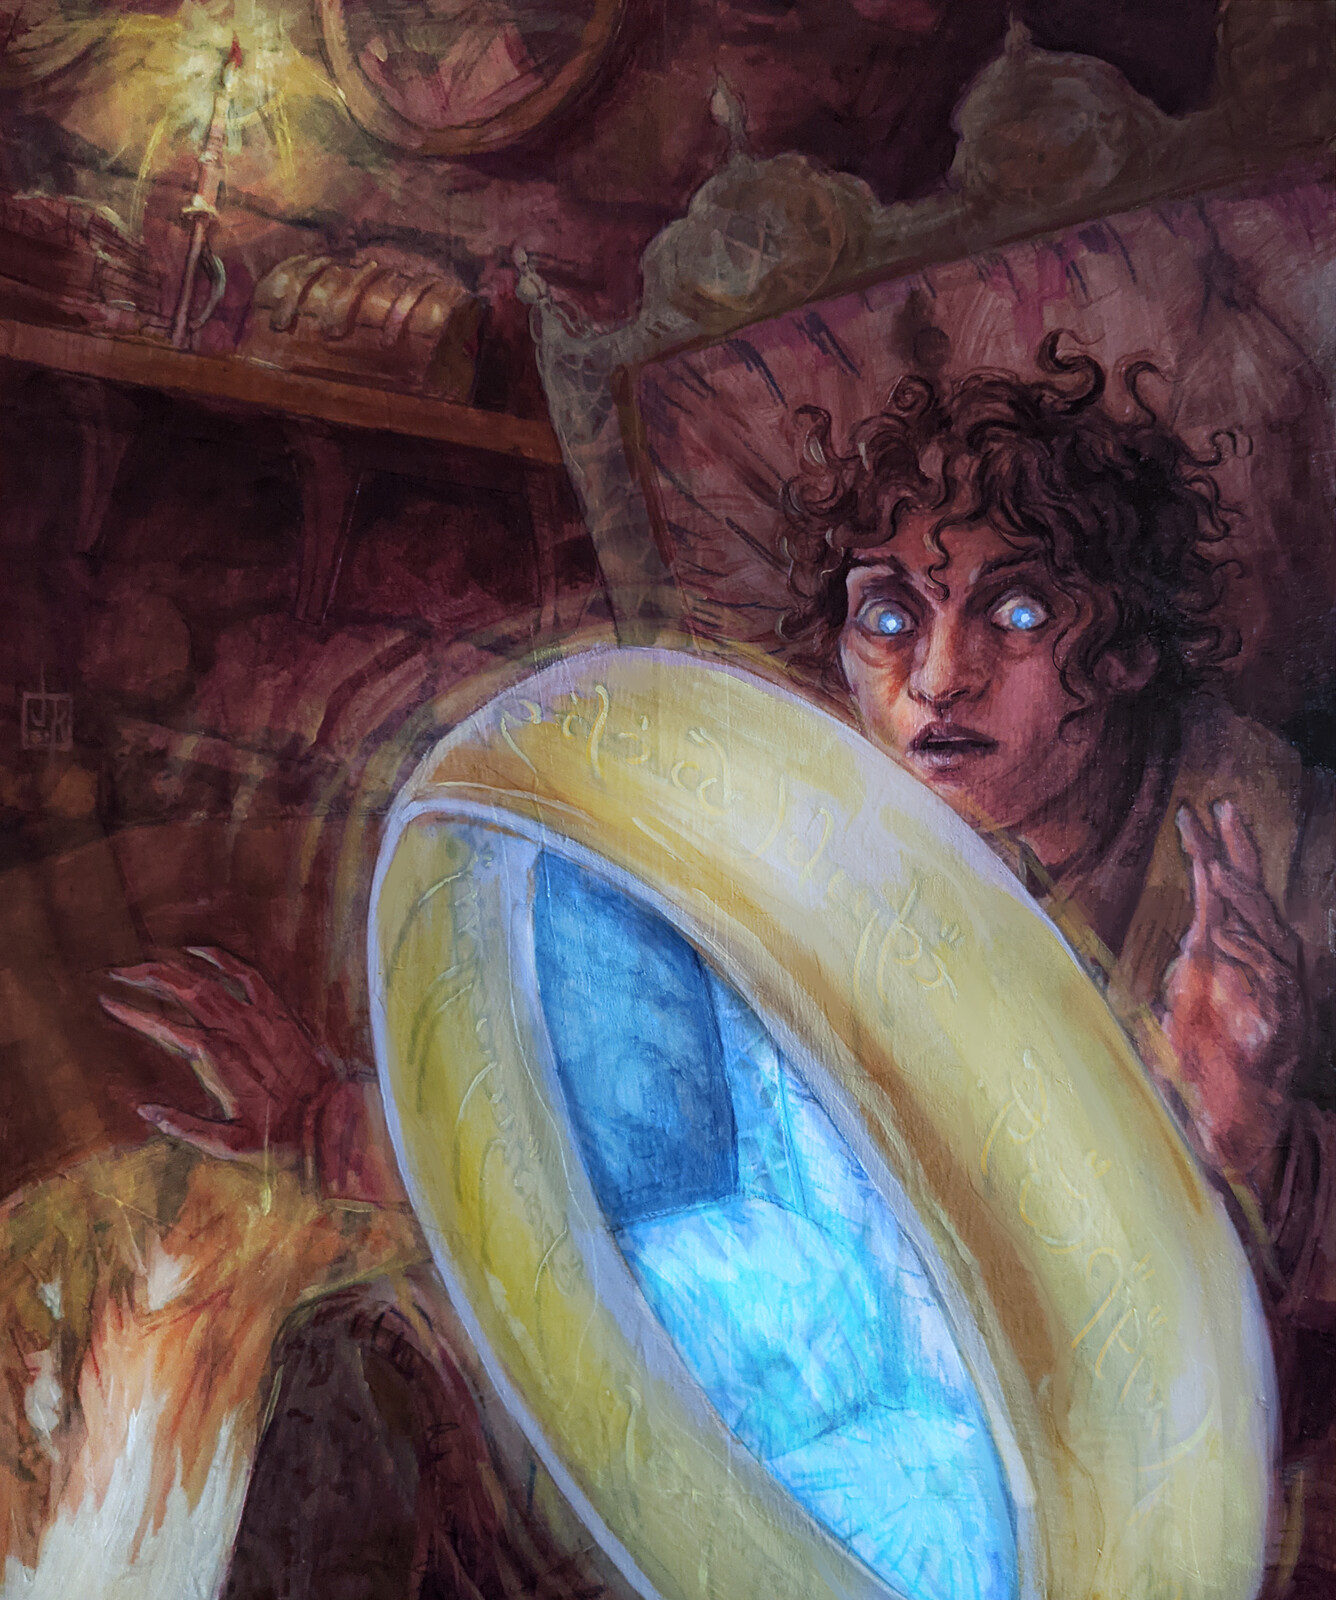 Frodo's Realization